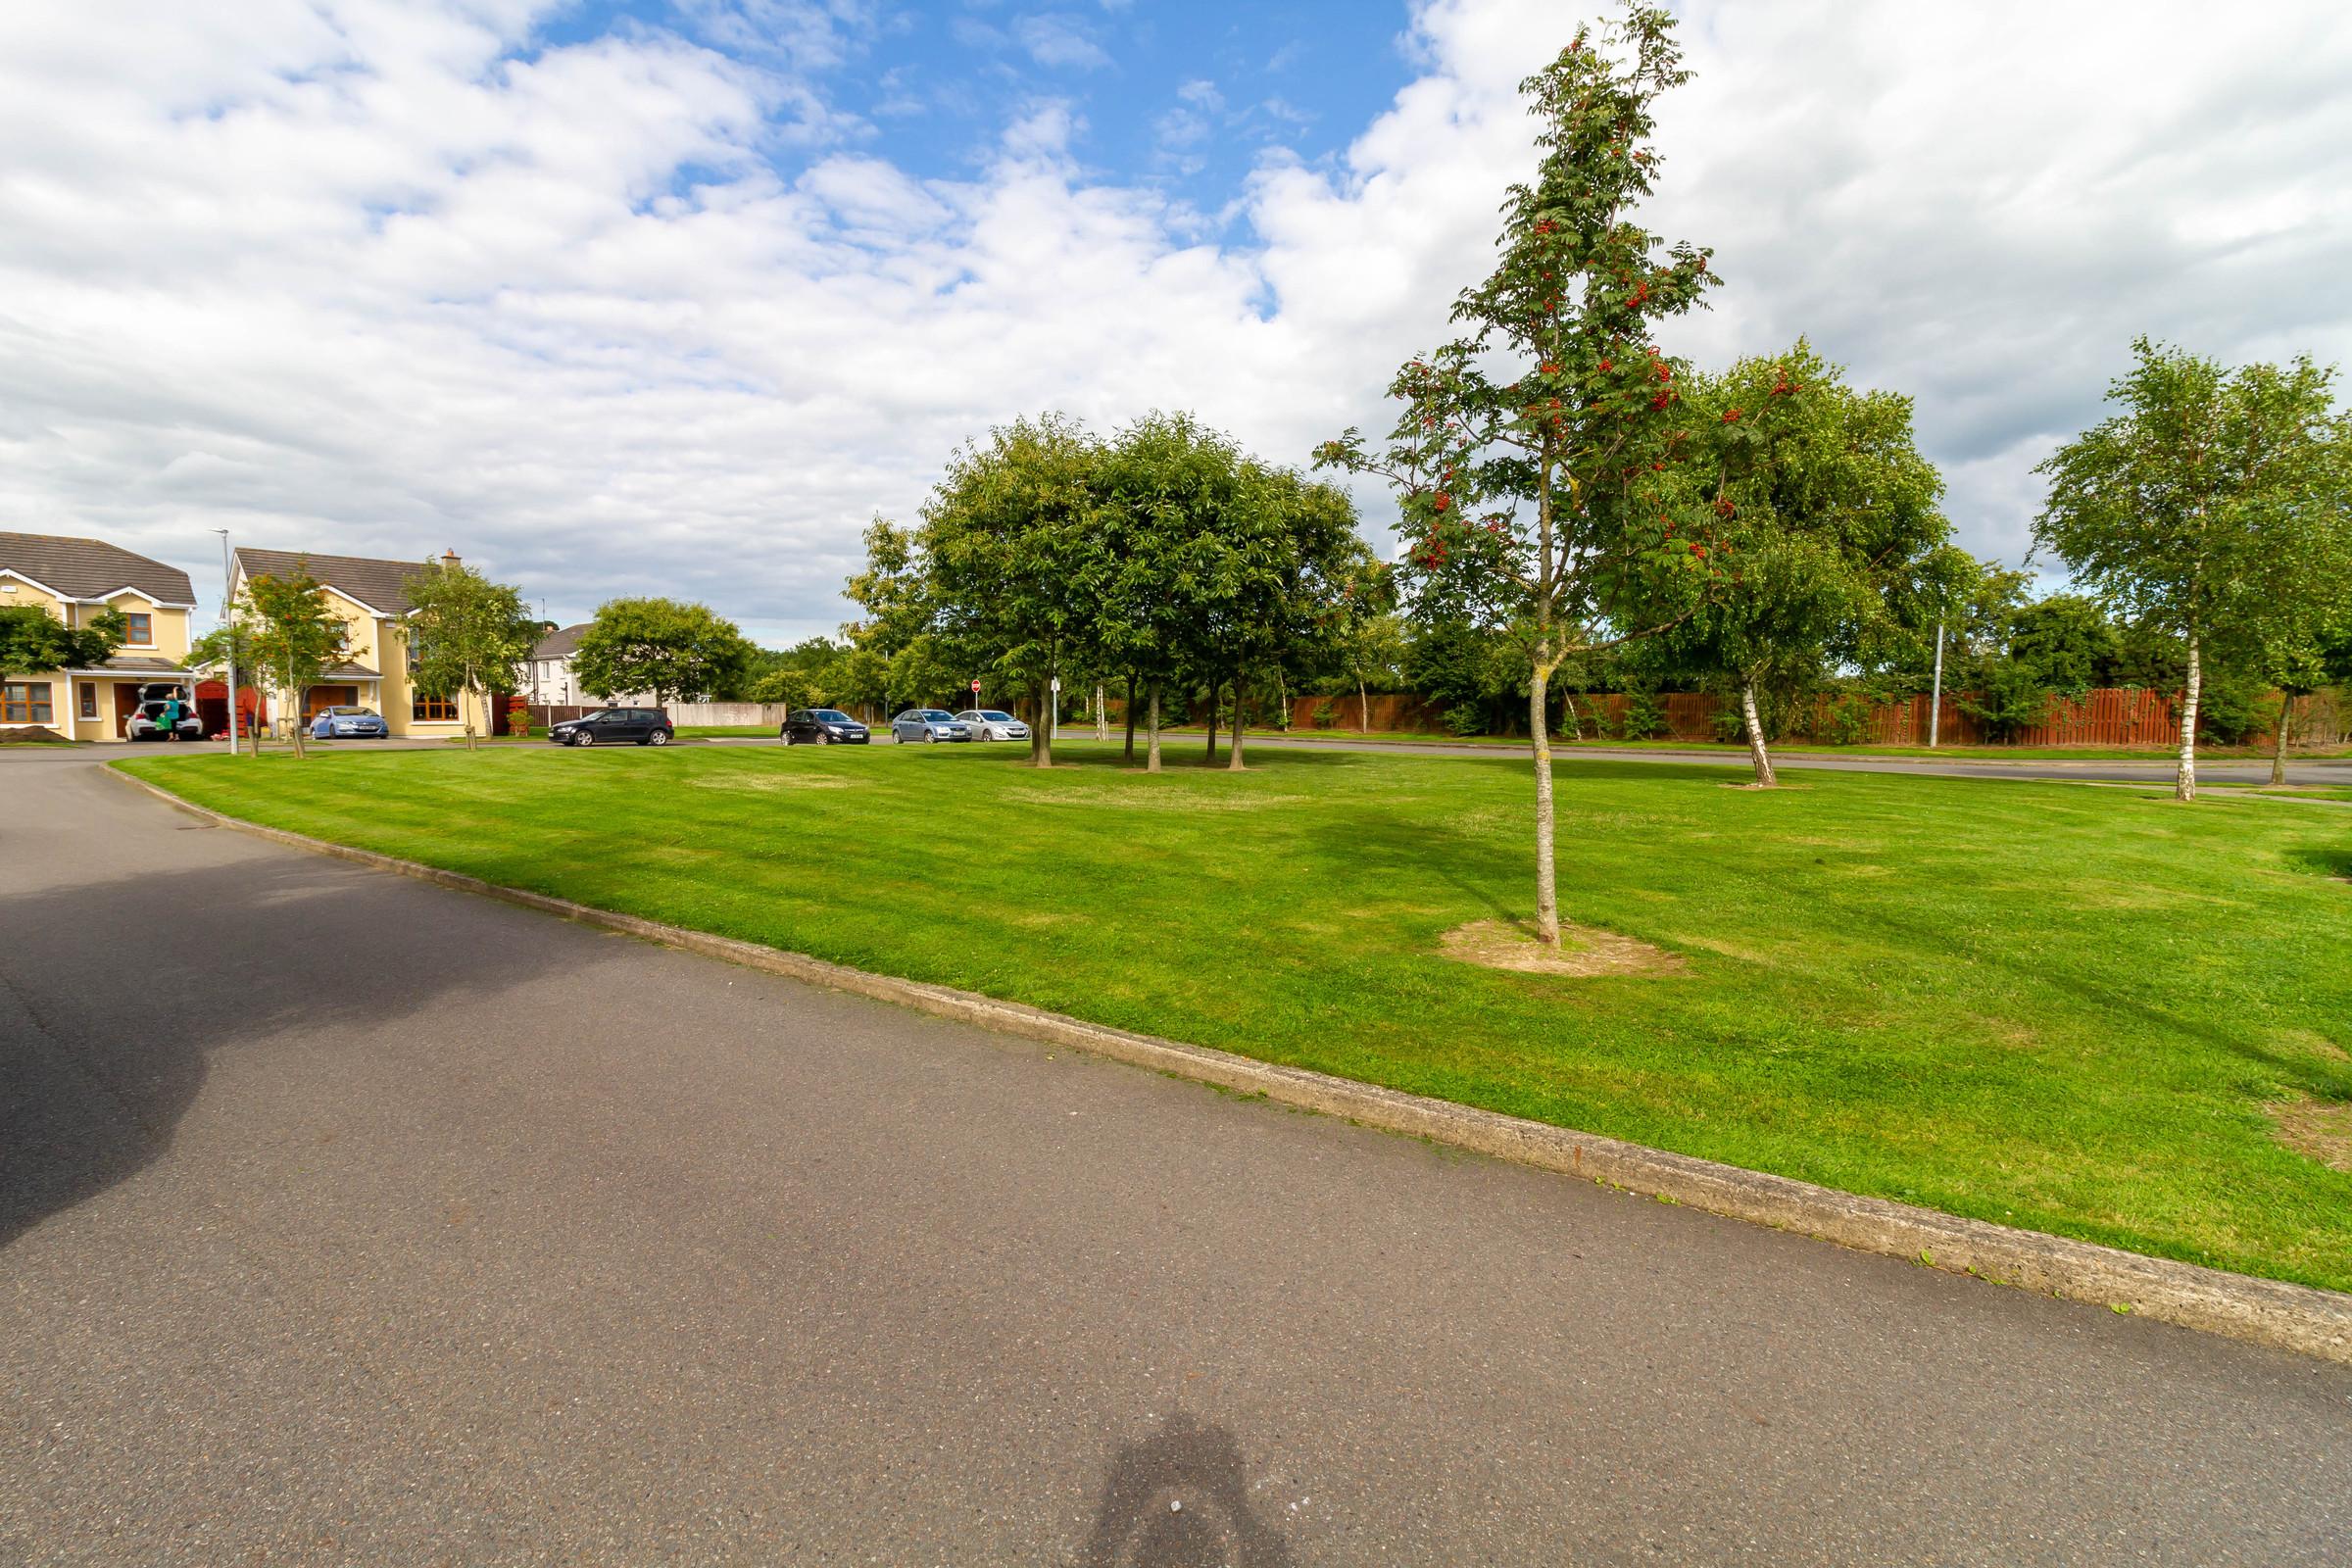 137 Meadow Gate, Gorey, Co. Wexford